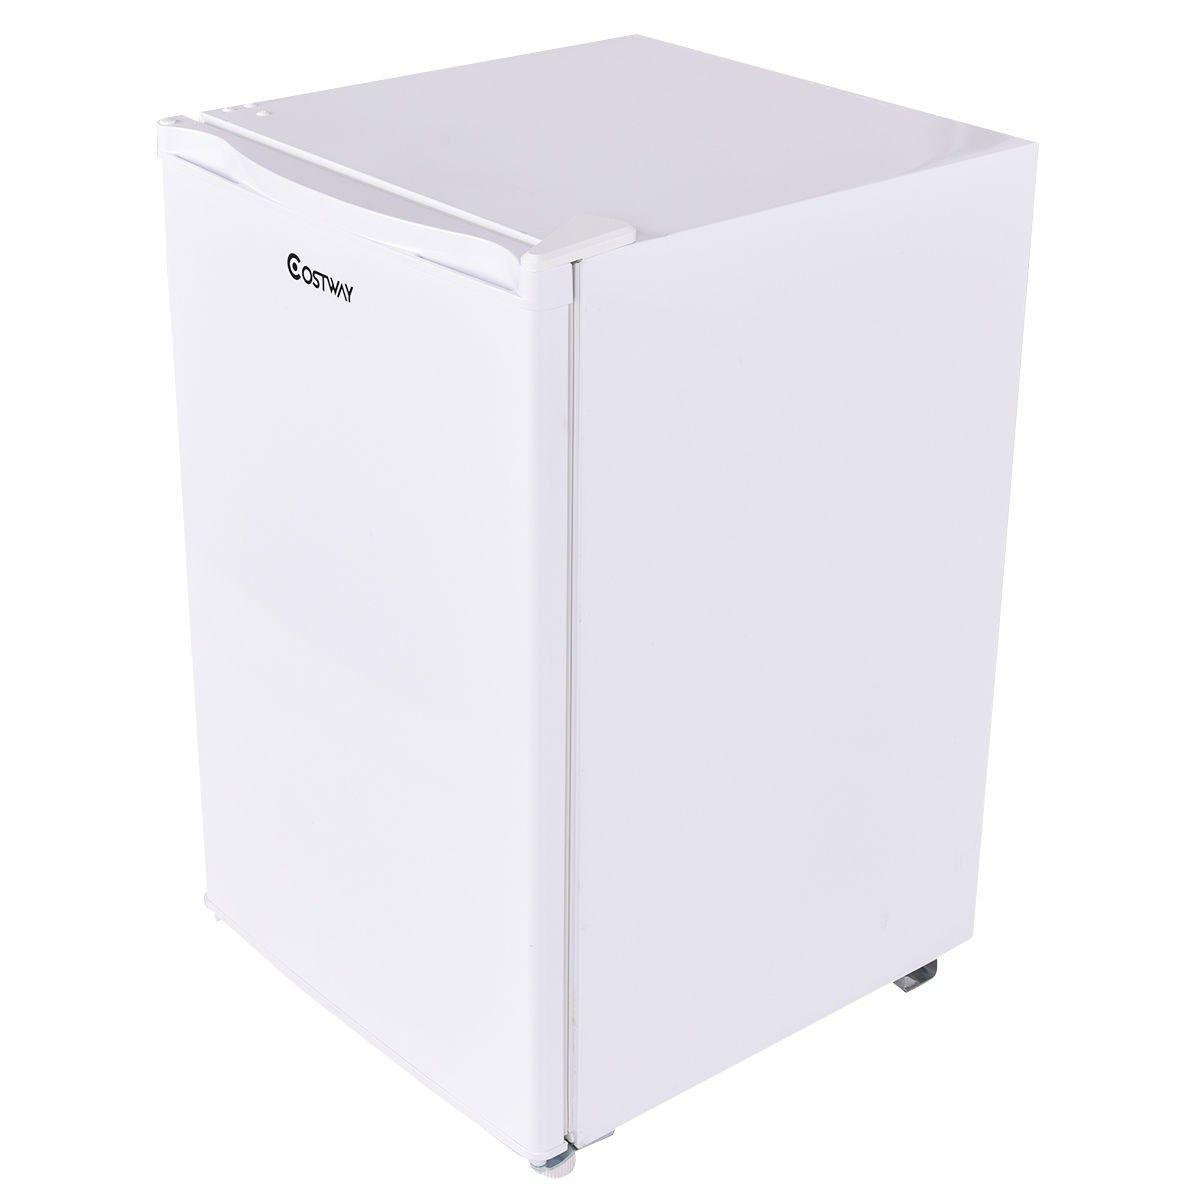 4.4 Cu. Ft. Compact Single Reversible Door Mini Refrigerator and ...